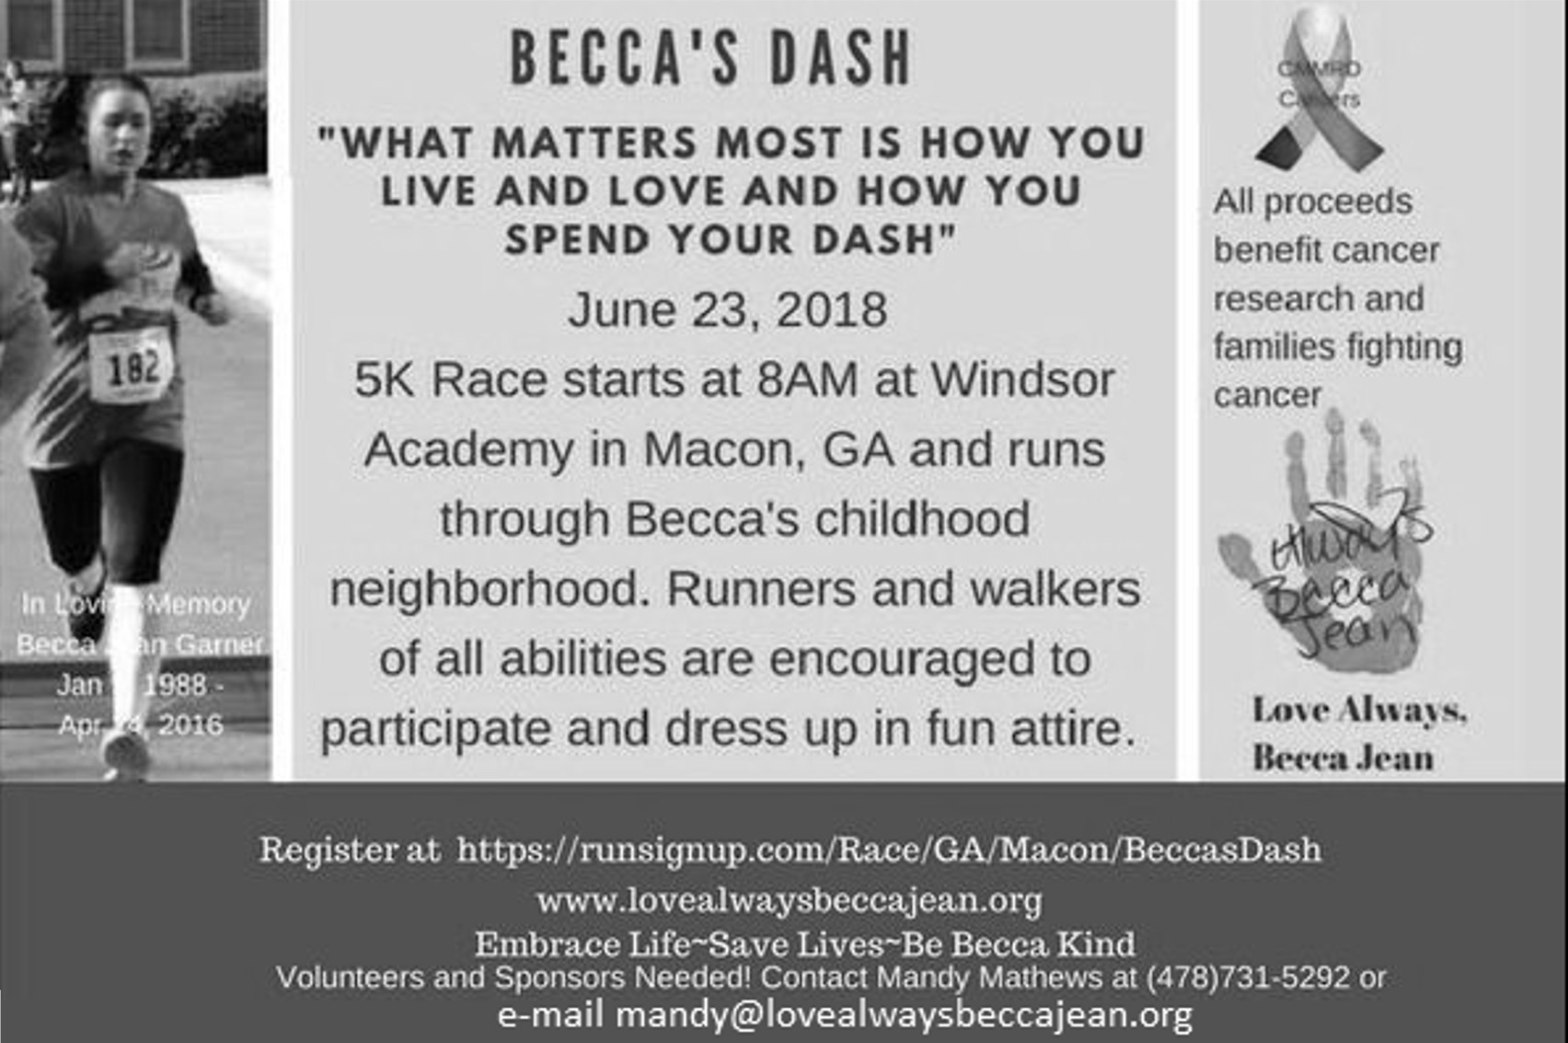 Becca's Dash Ad